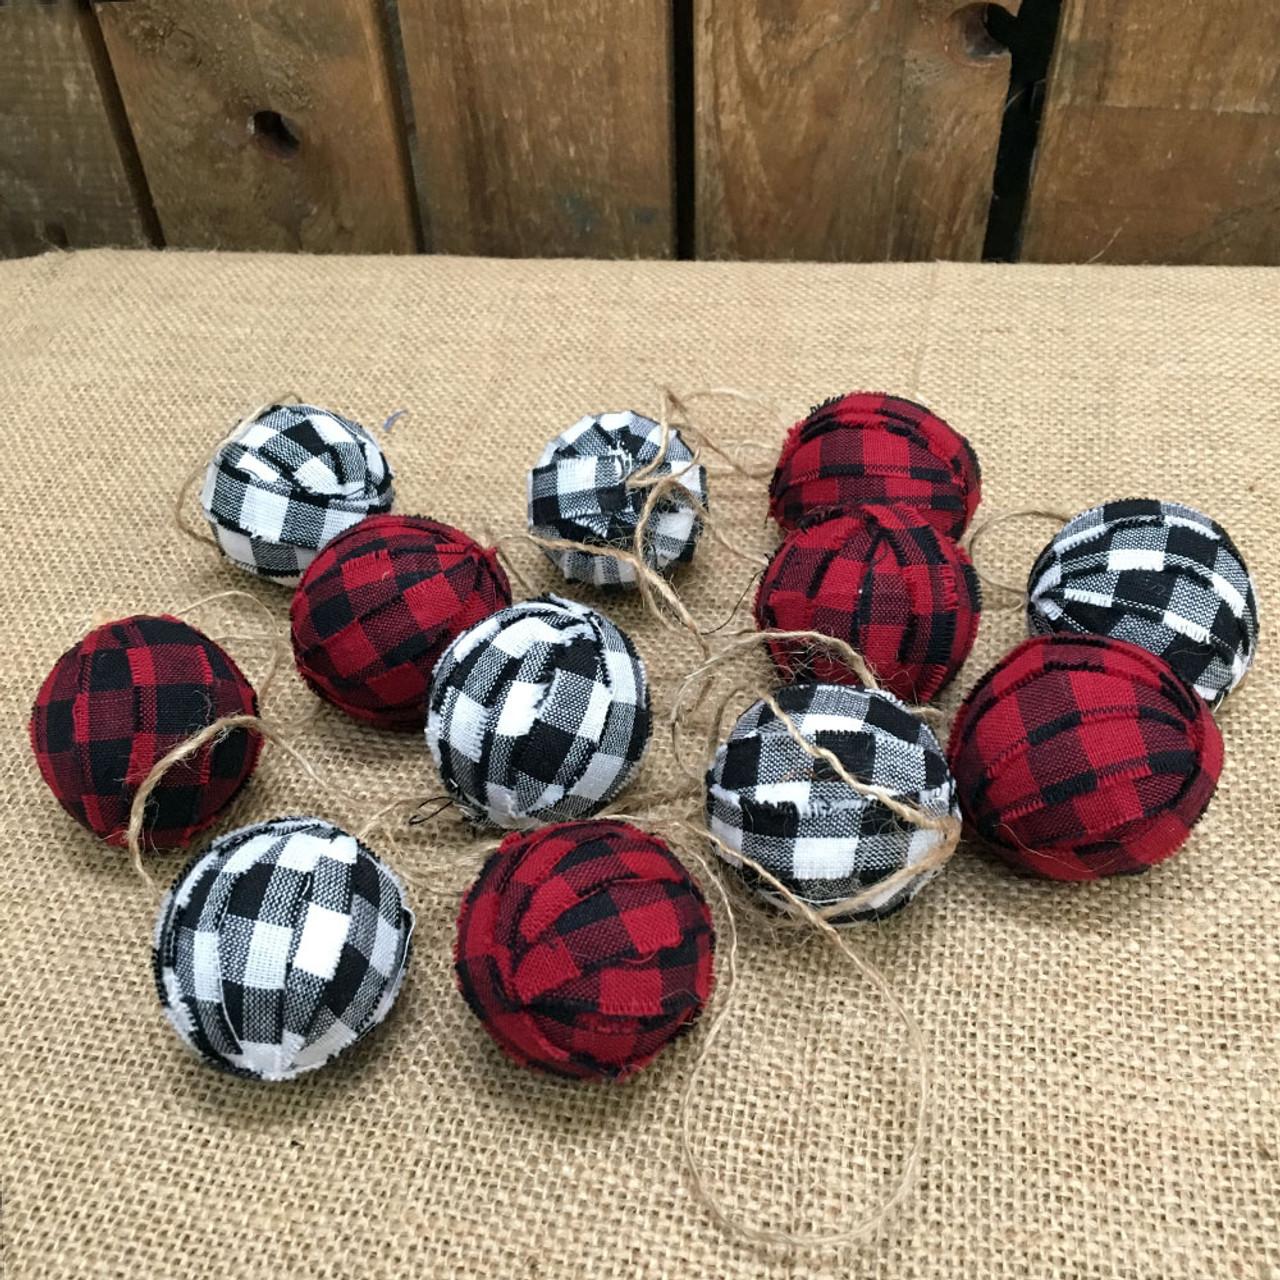 Red, White & Black Mini Buffalo Plaid Homespun Christmas Ball Ornaments Set of 12